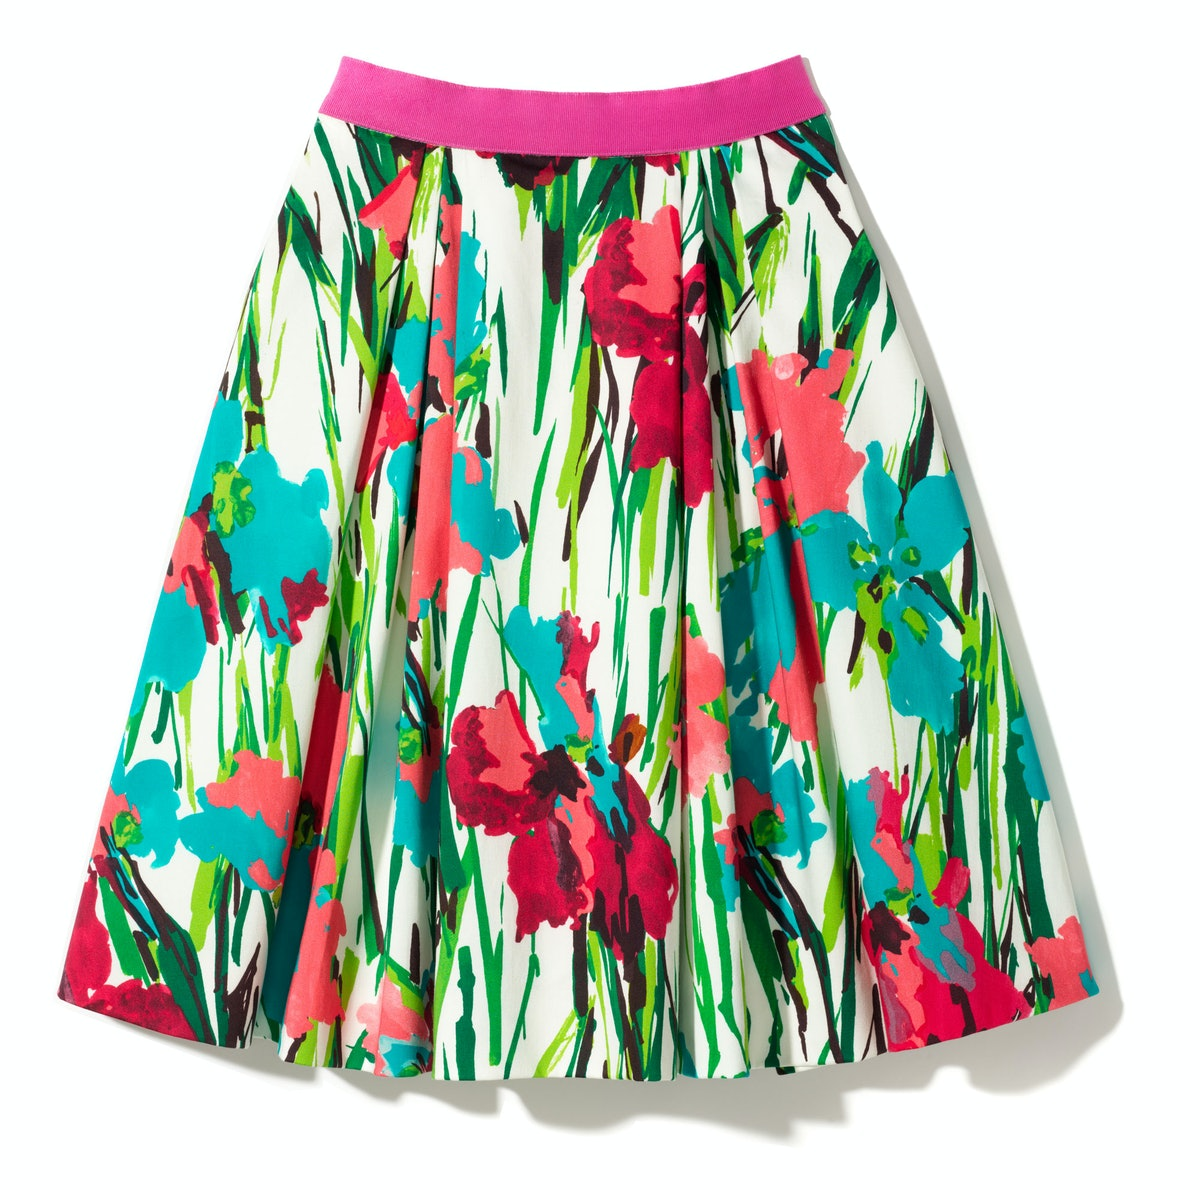 Blumarine skirt, $860, [blumarine.com](http://blumarine.com/).